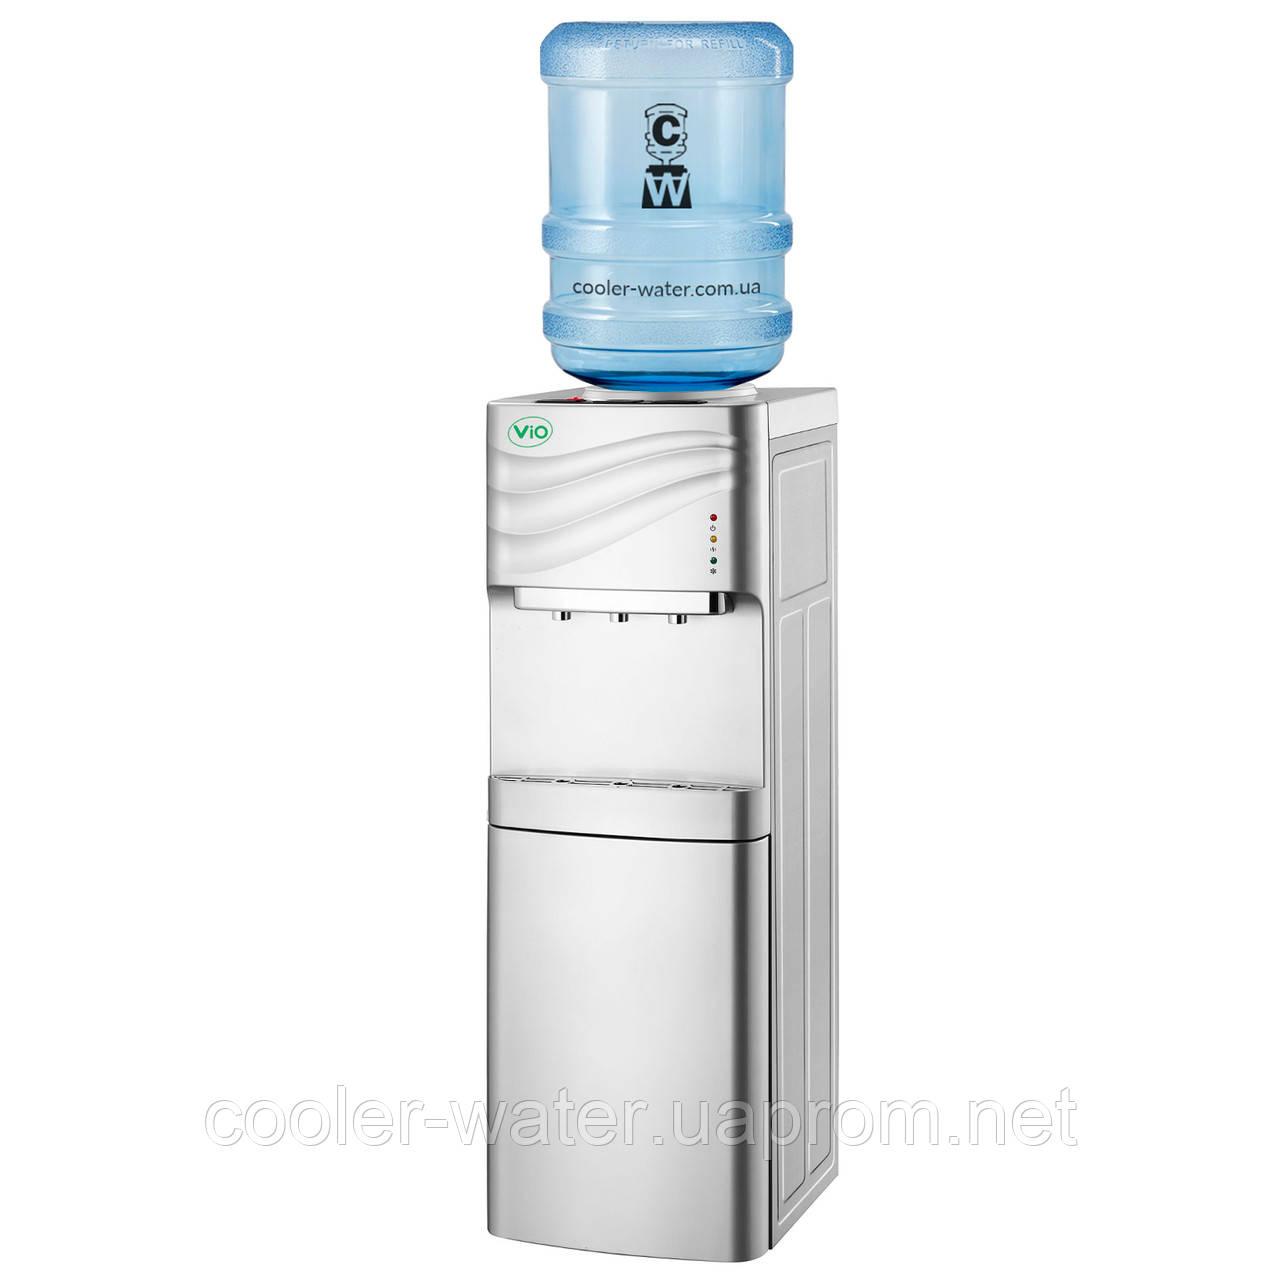 Кулер для воды ViO X-903 FCC Silver со шкафчиком